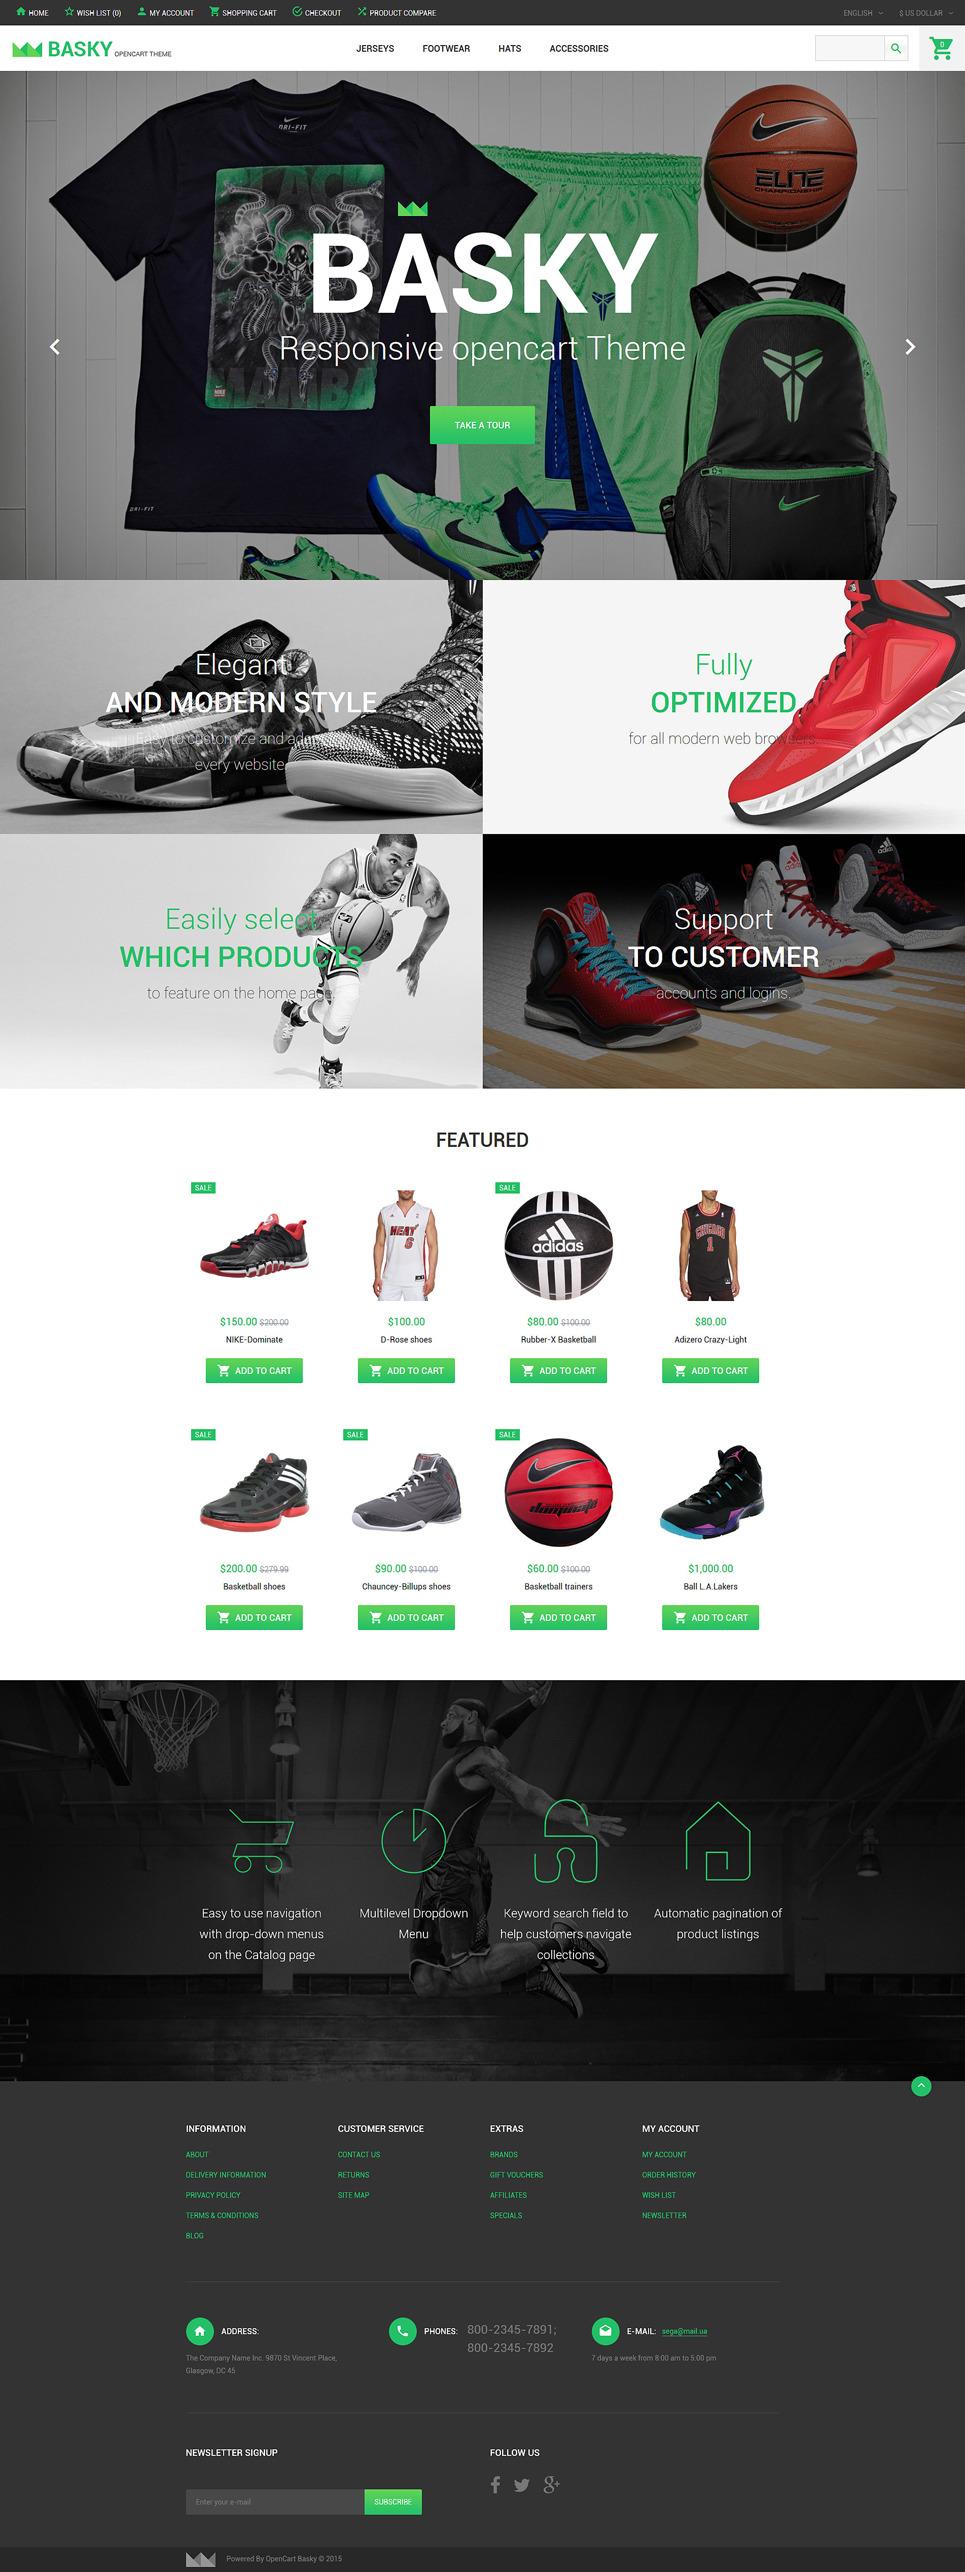 Basky OpenCart Template New Screenshots BIG